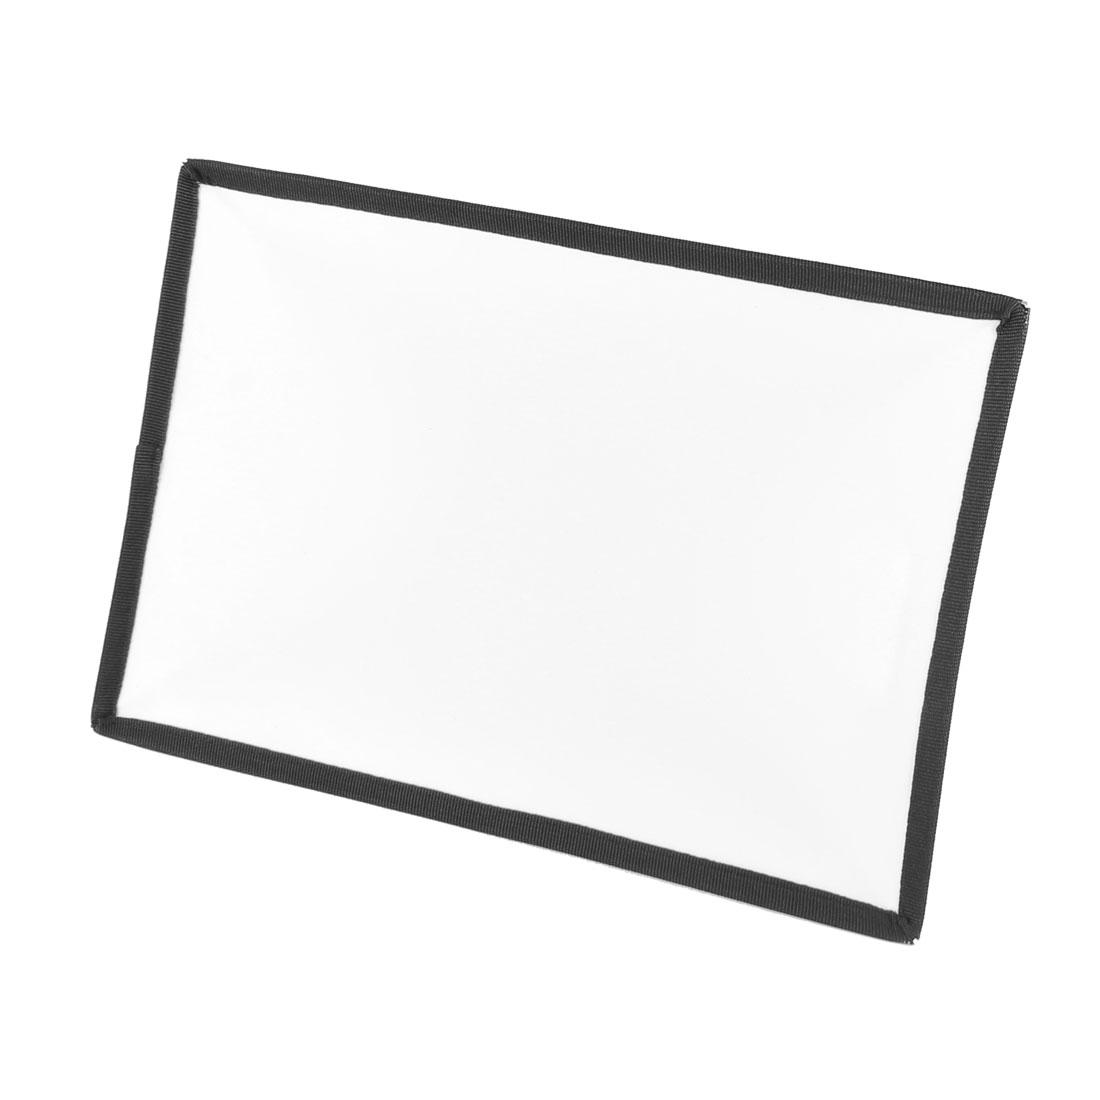 Rectangle Black Soft Box Flash Diffuser 29x20cm for Digital SLR Camera